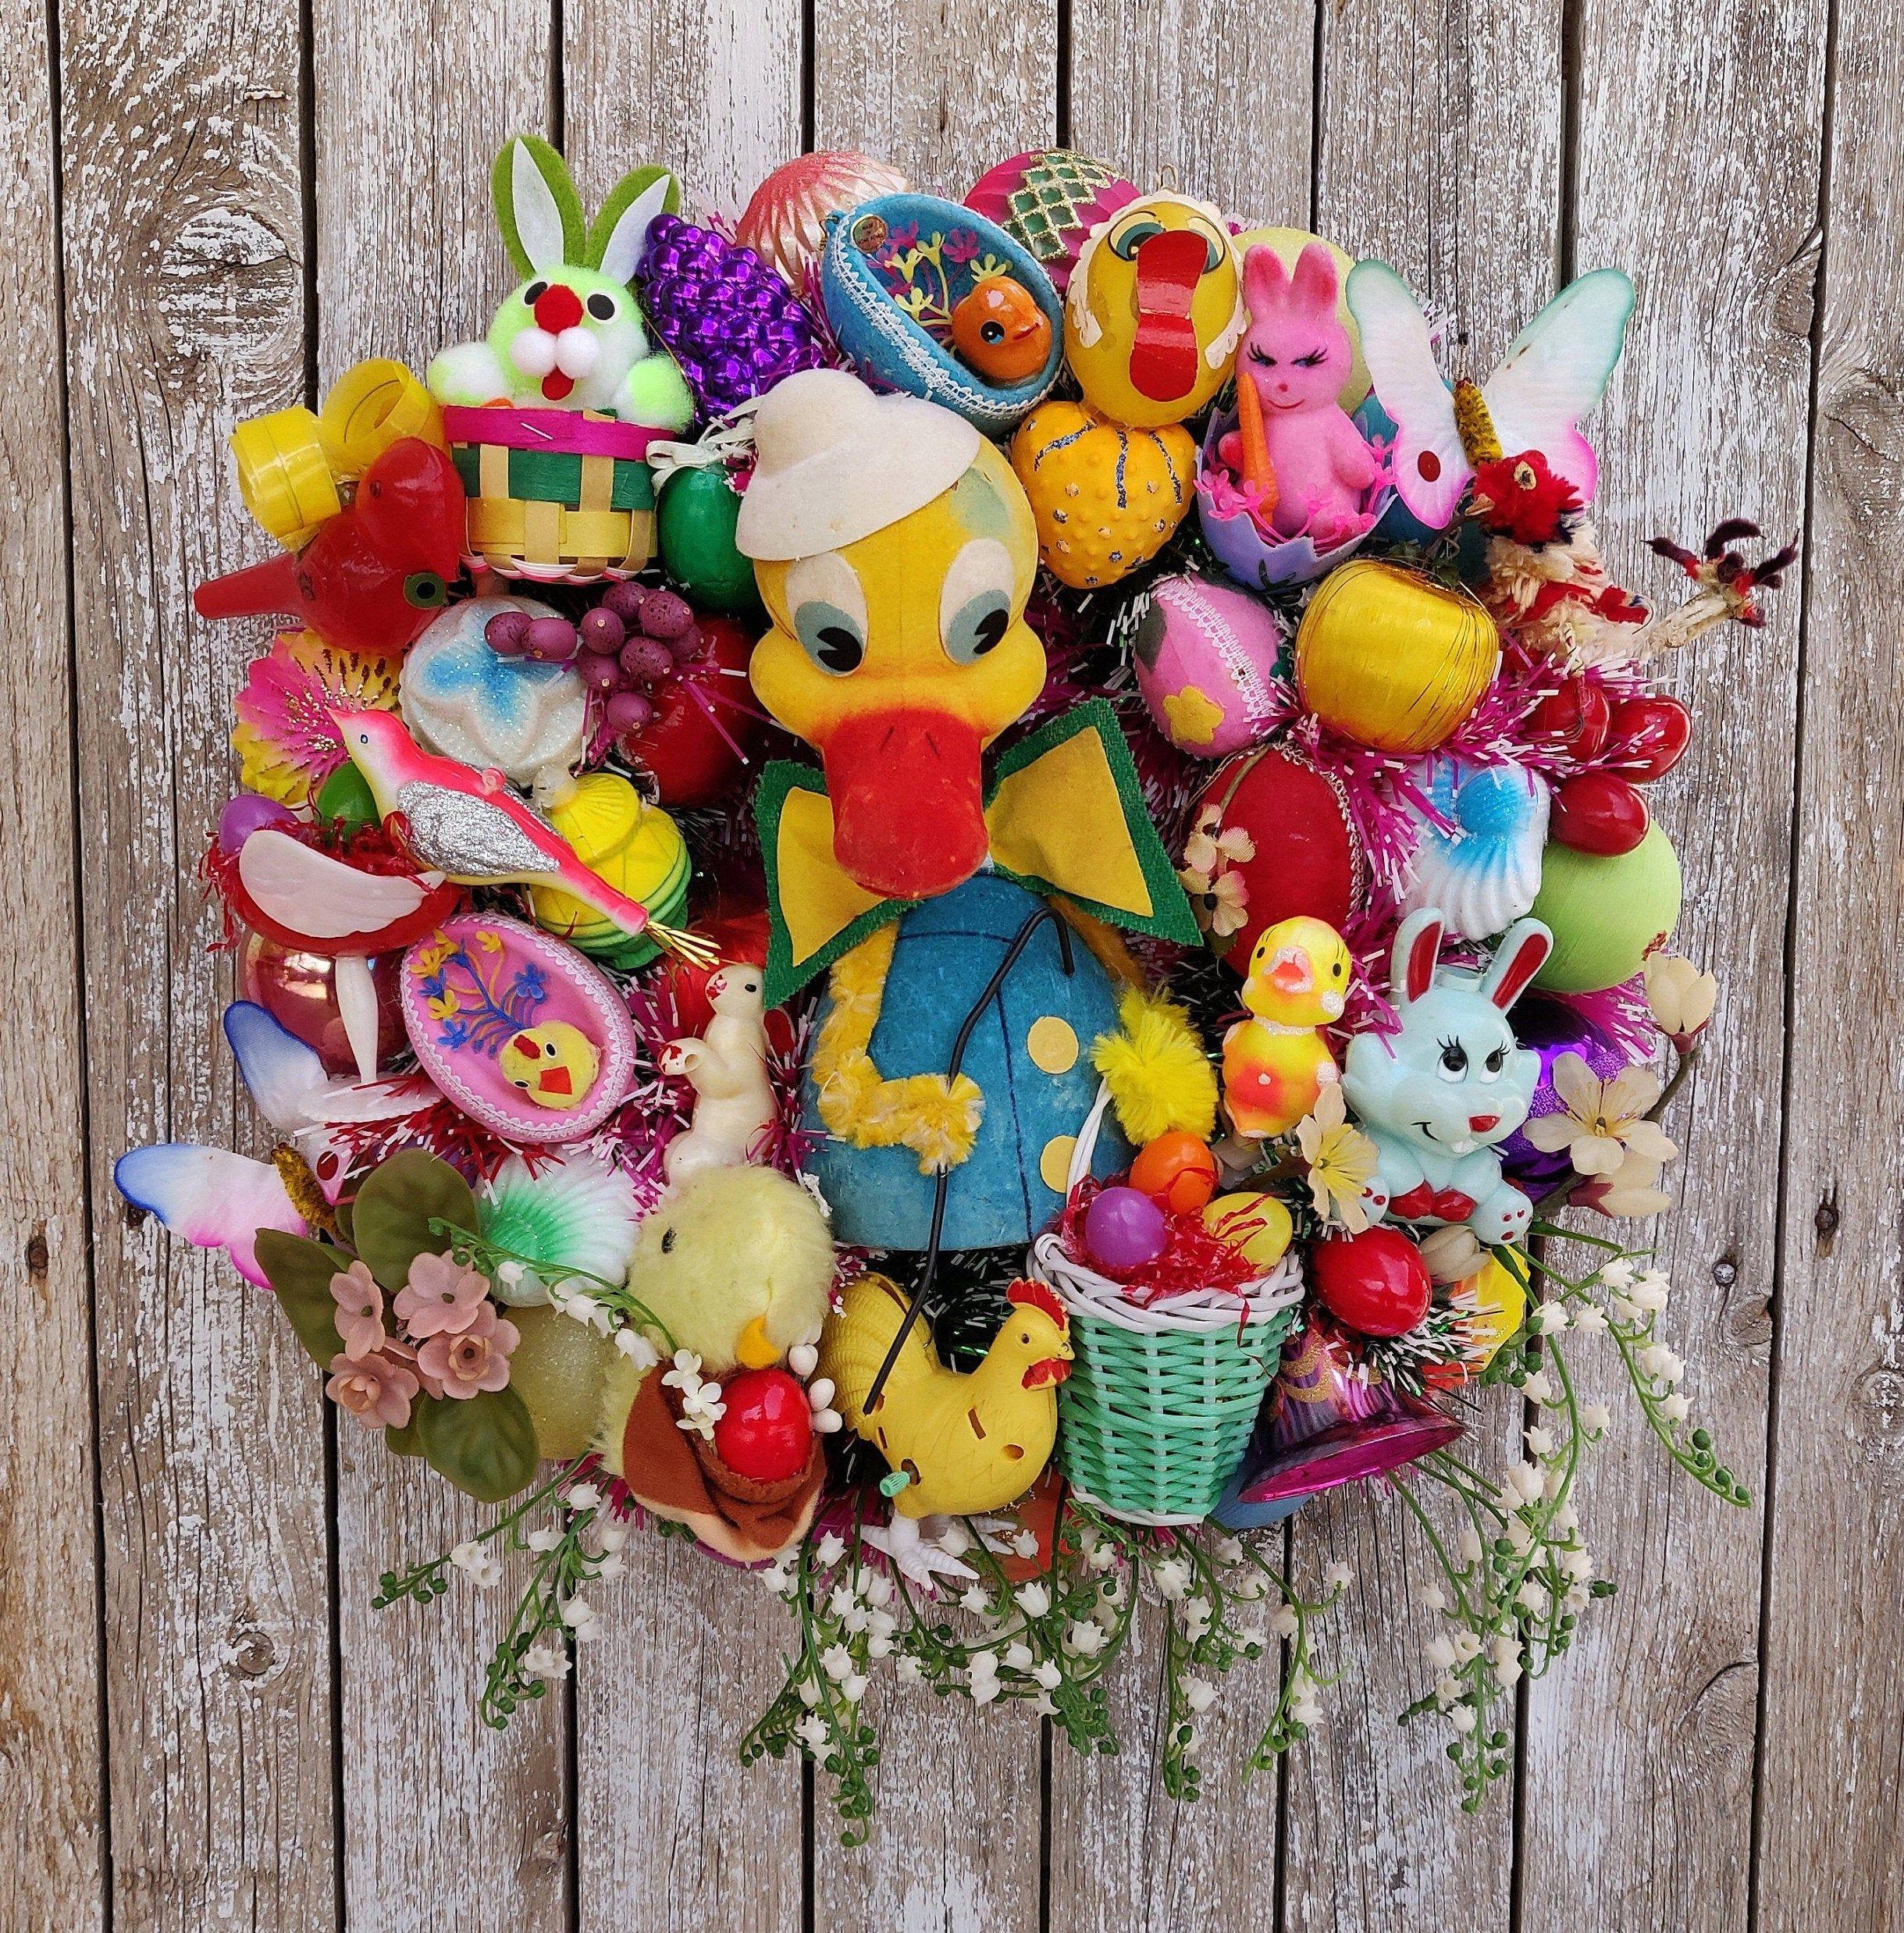 Easter Wreaths For Front Door Vintage Easter Decorations Easter